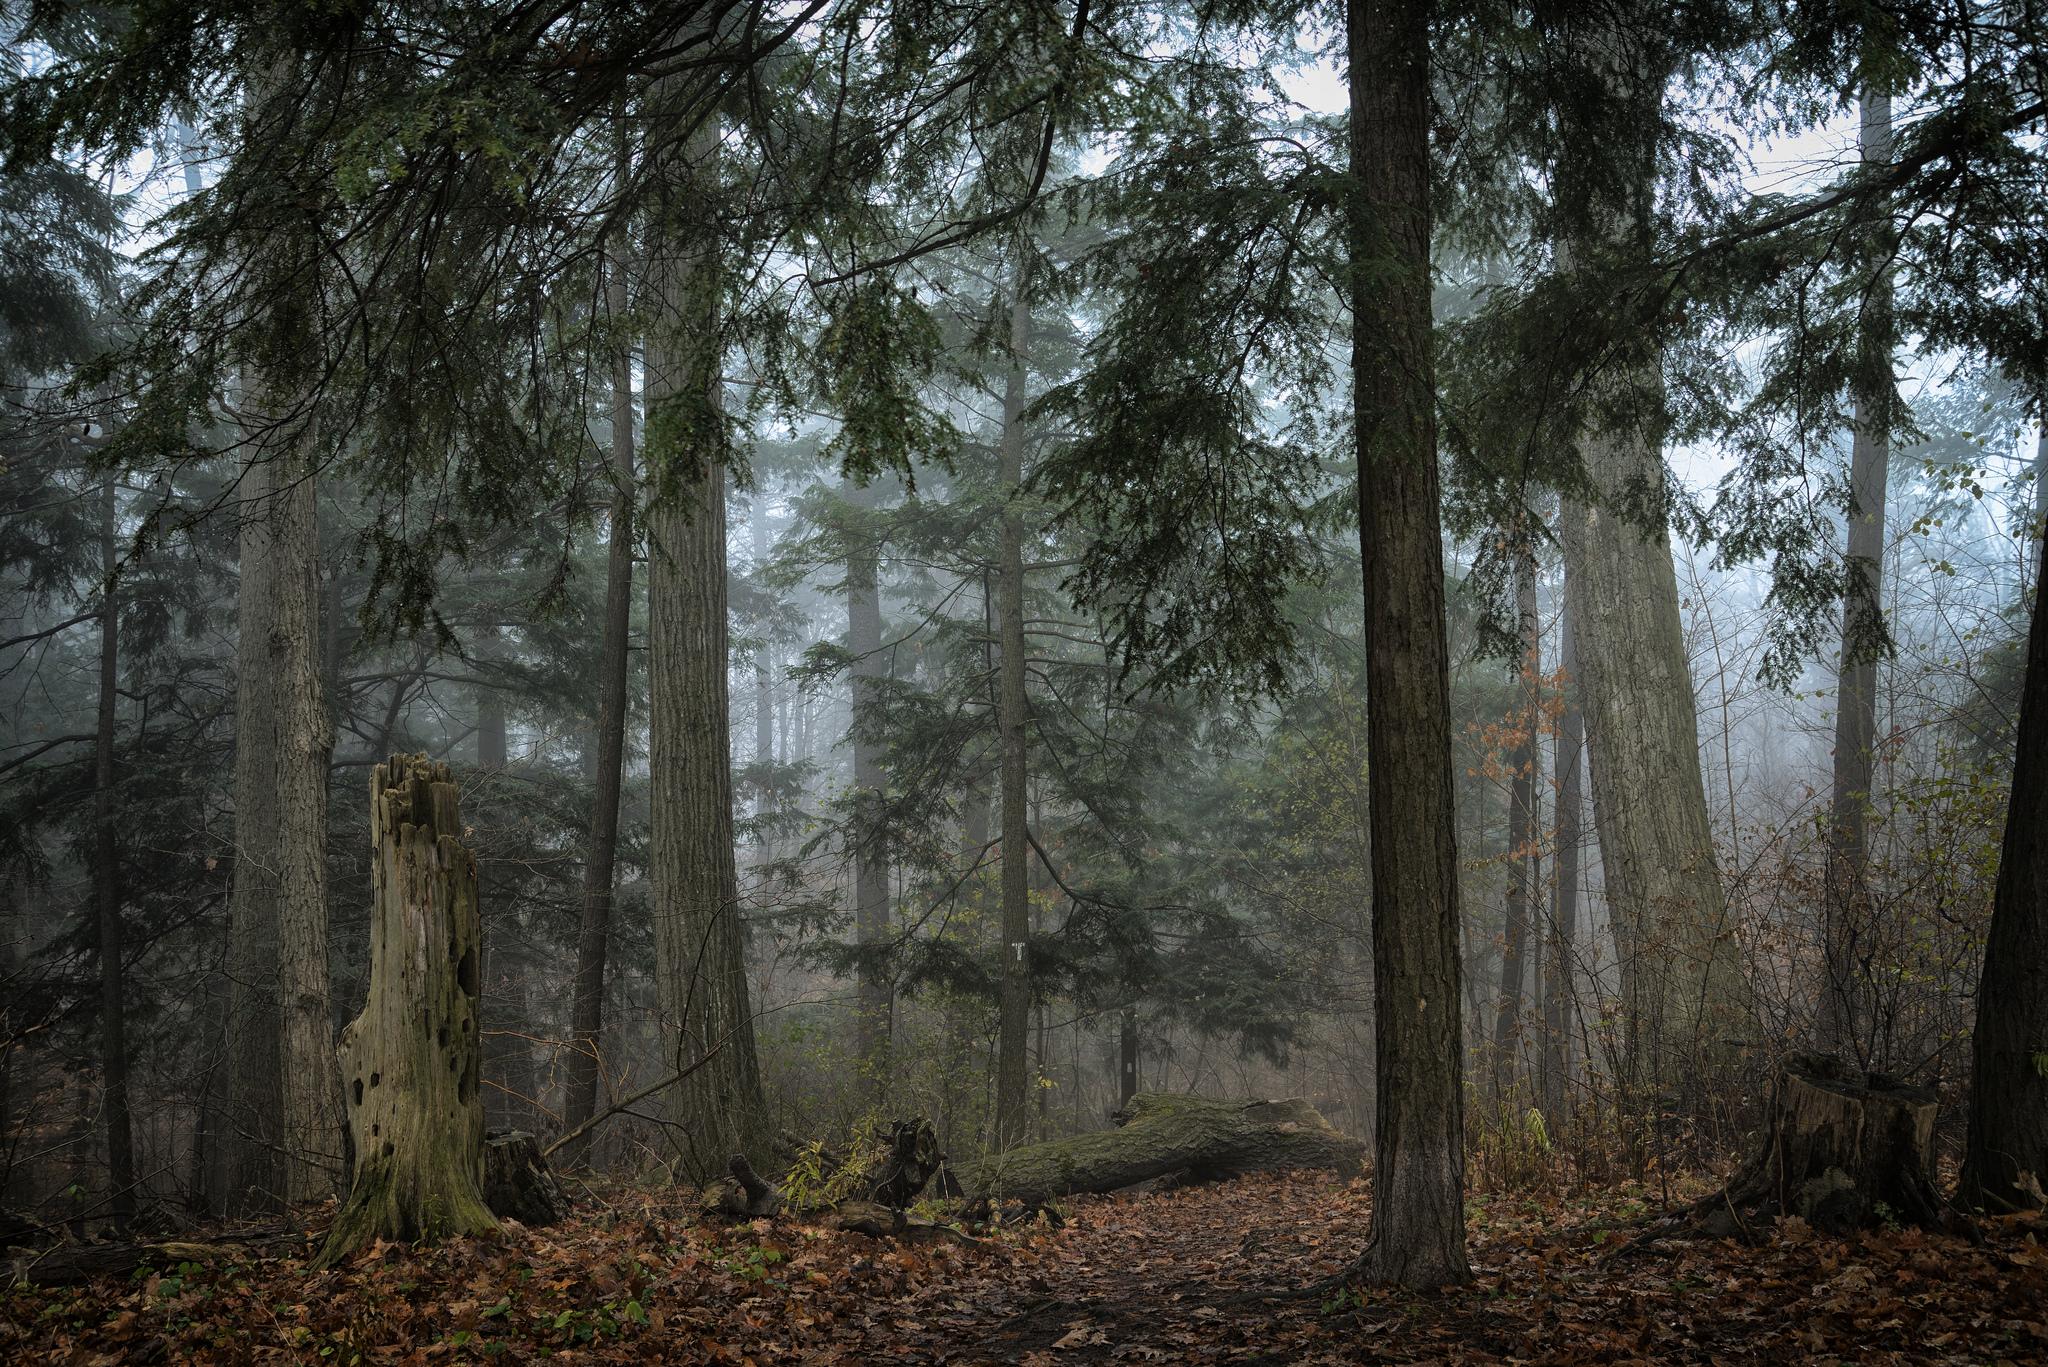 545997_trees_fog_homer_watson_park_kitchener_ontario_cana_2048x1367_(www_GdeFon_ru).jpg